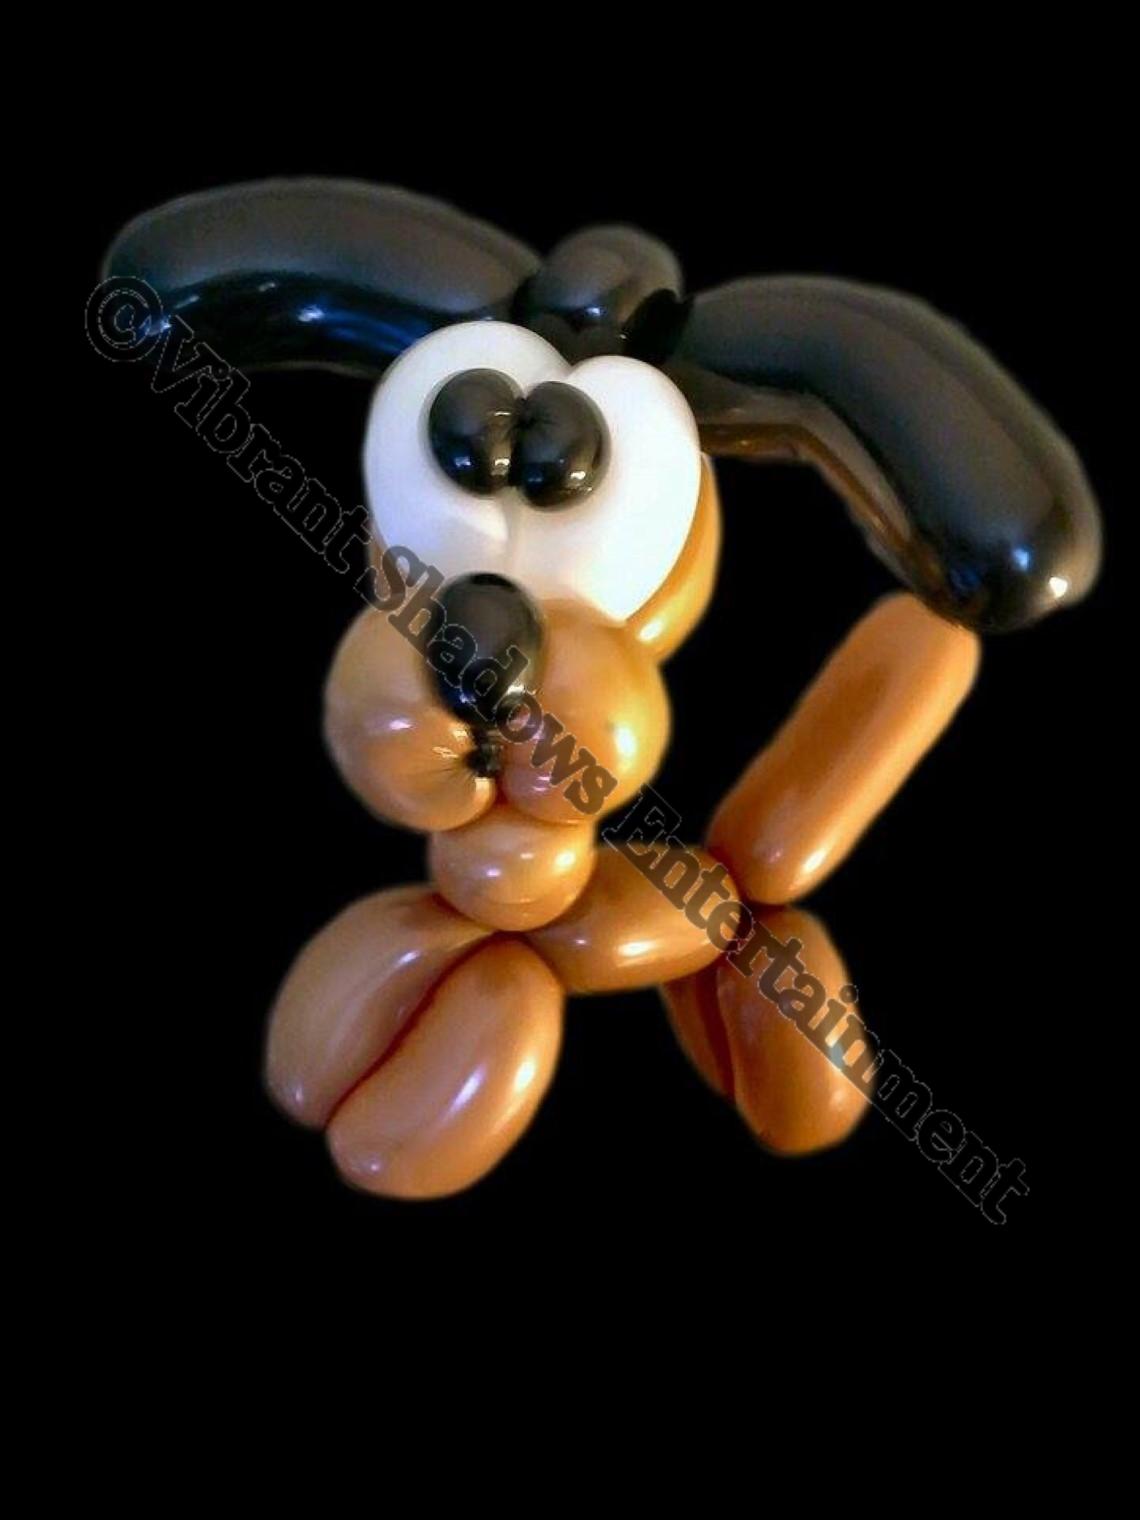 Puppy balloon sculpture